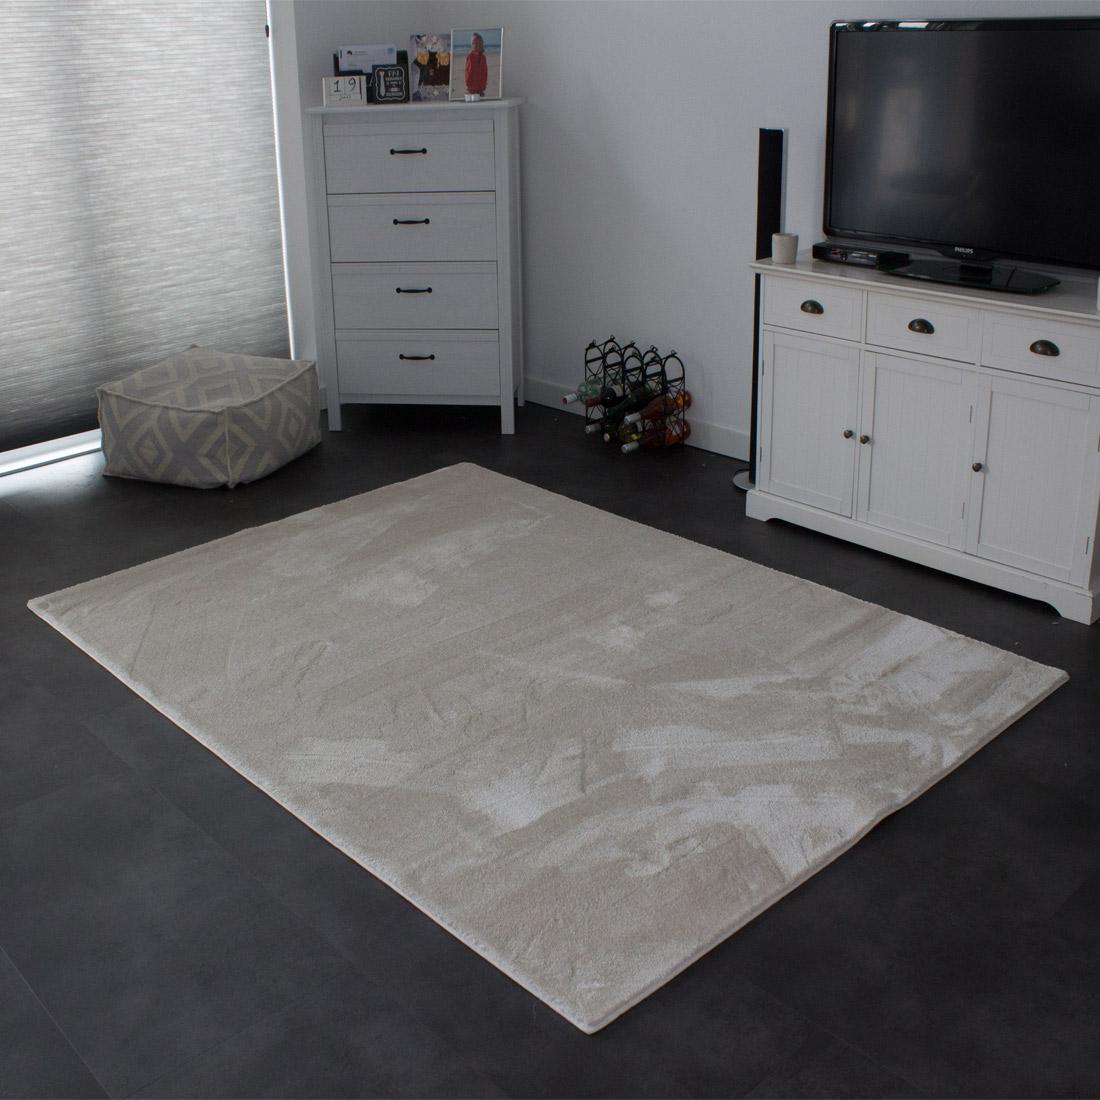 Vloerkleed Xilento Soft Linnen | 200 x 300 cm